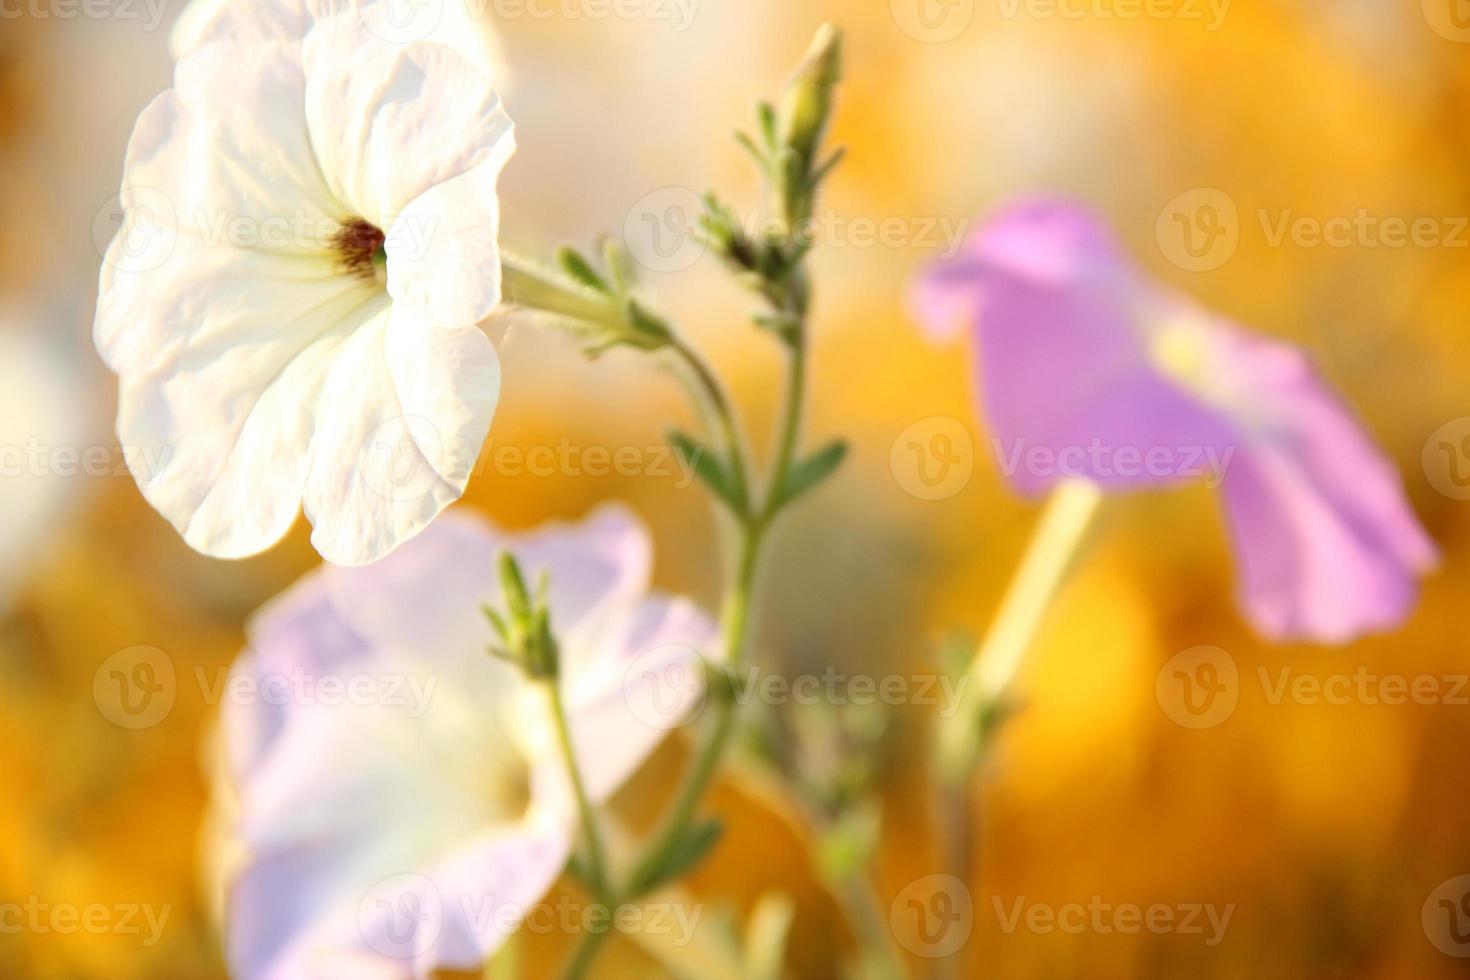 petunia pittoresco 1 foto